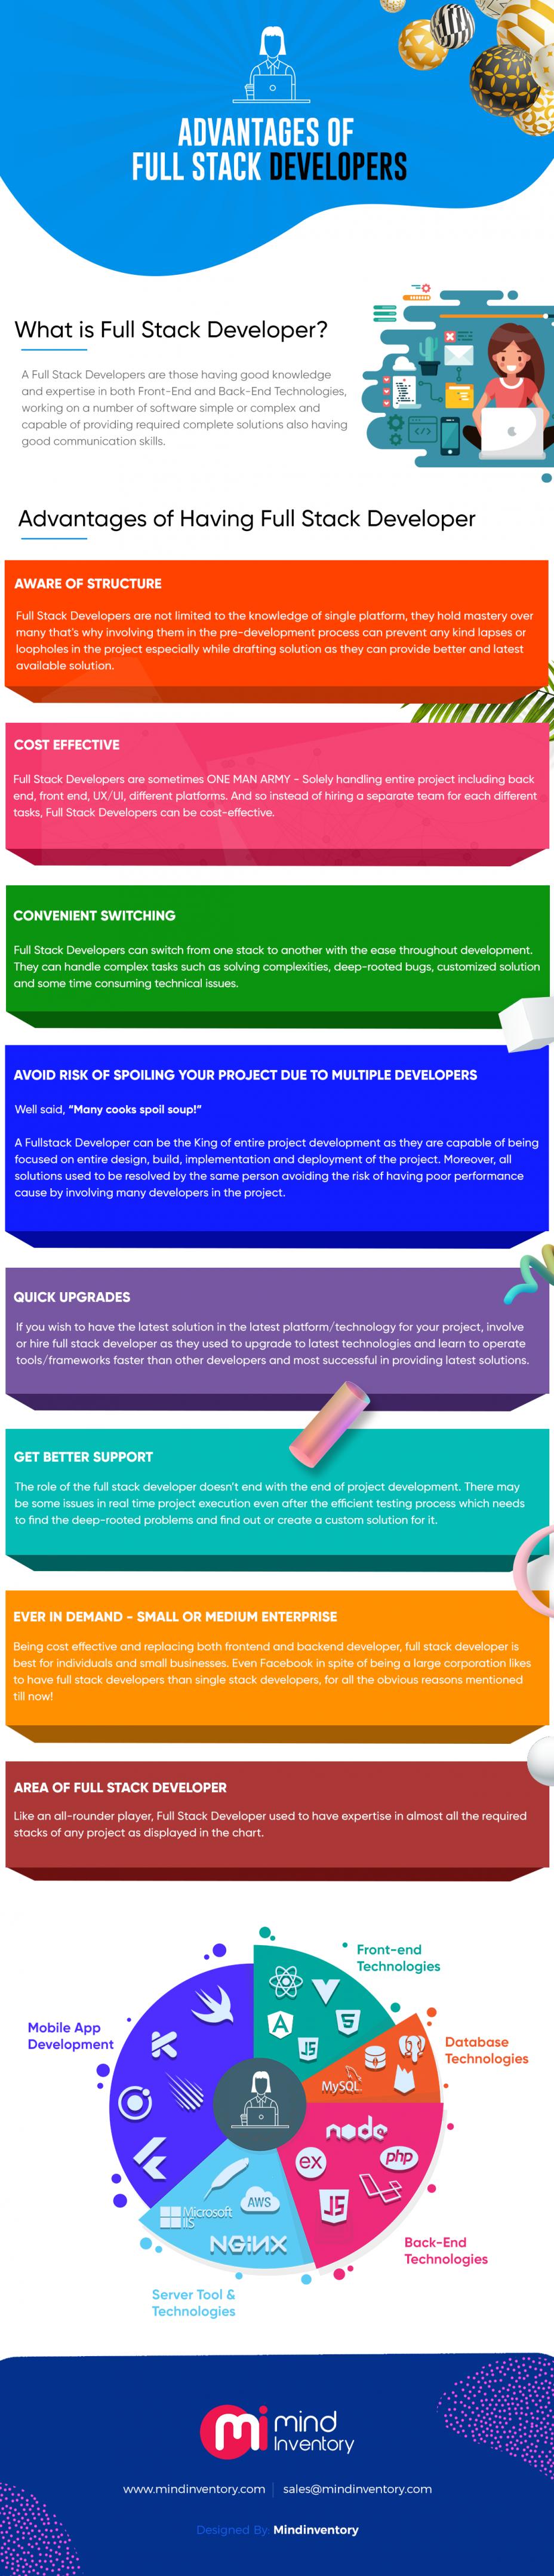 Advantages of Hiring Full Stack Developers Full stack